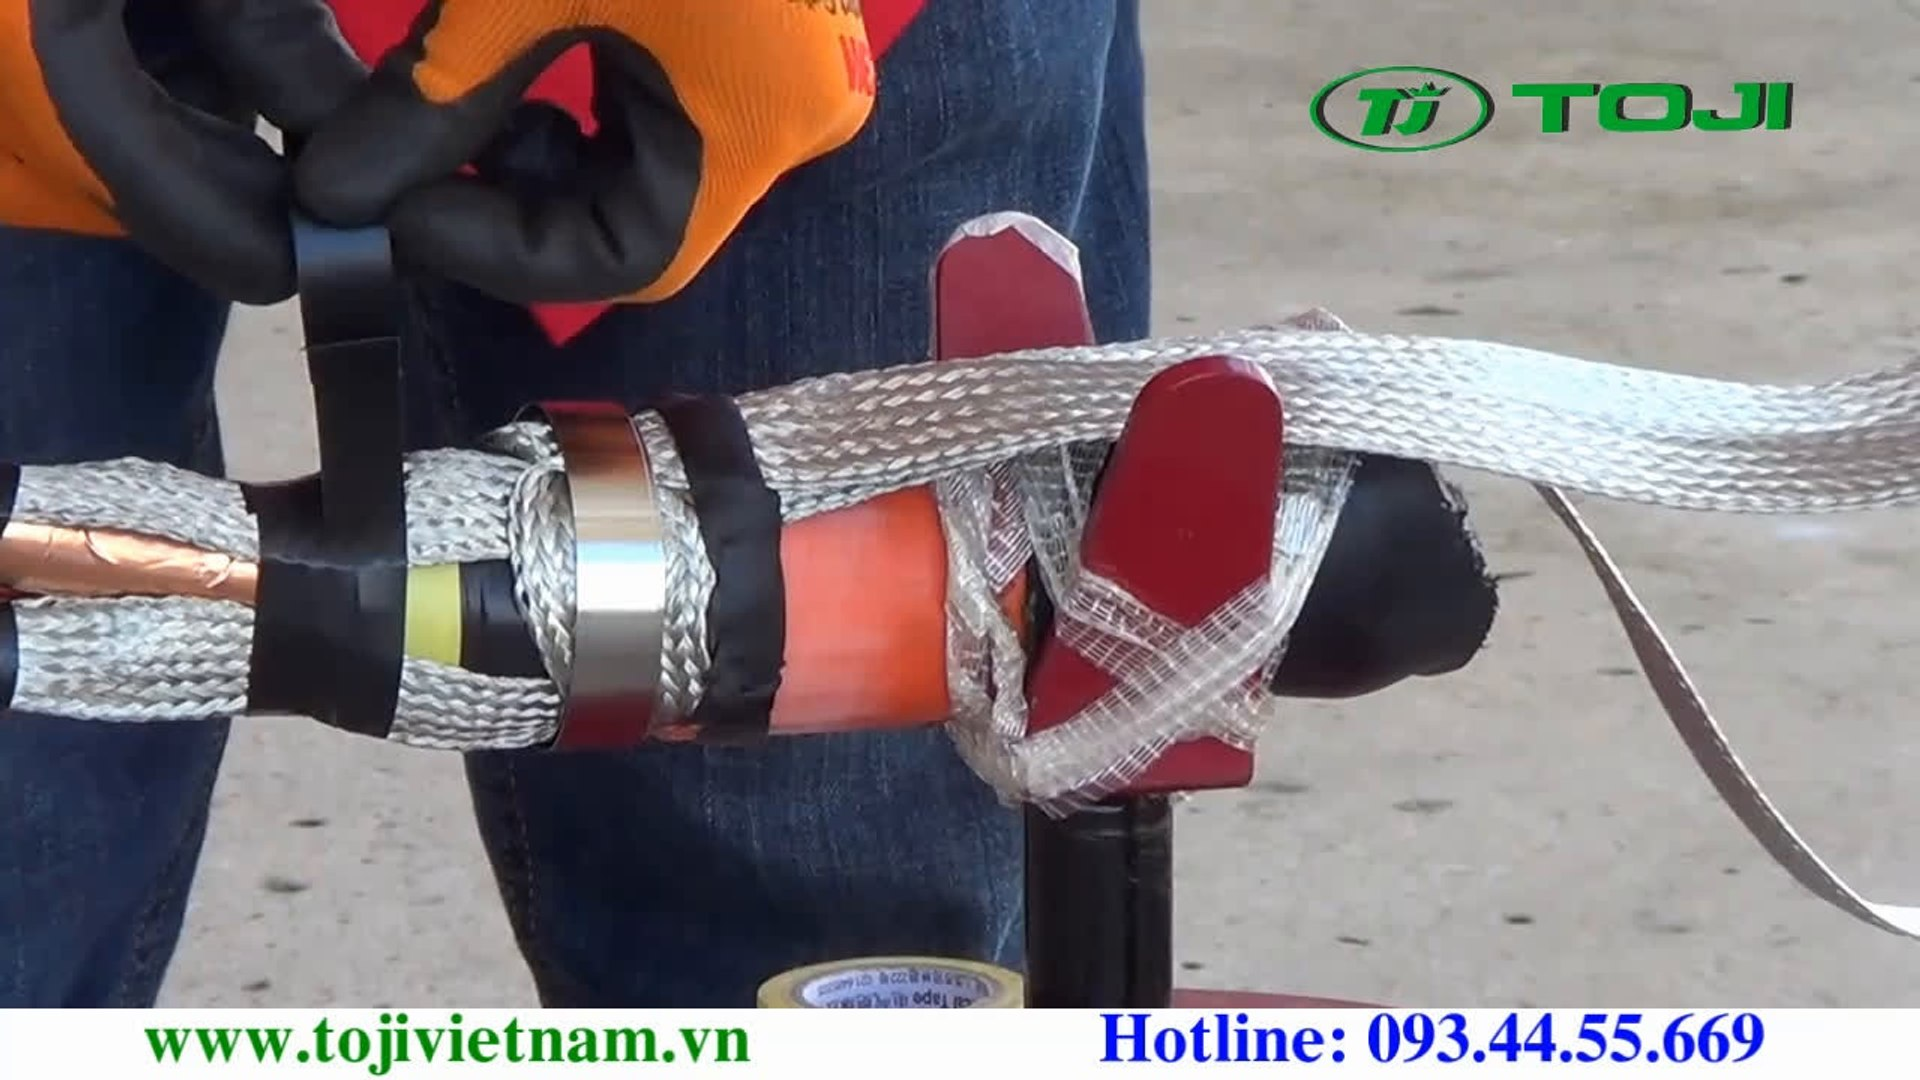 7.Video huong dan lam dau cap co rut nguoi 3M -Buoc 7-Phu kin co chia niem cap [TOJI.VN] Phan phoi d